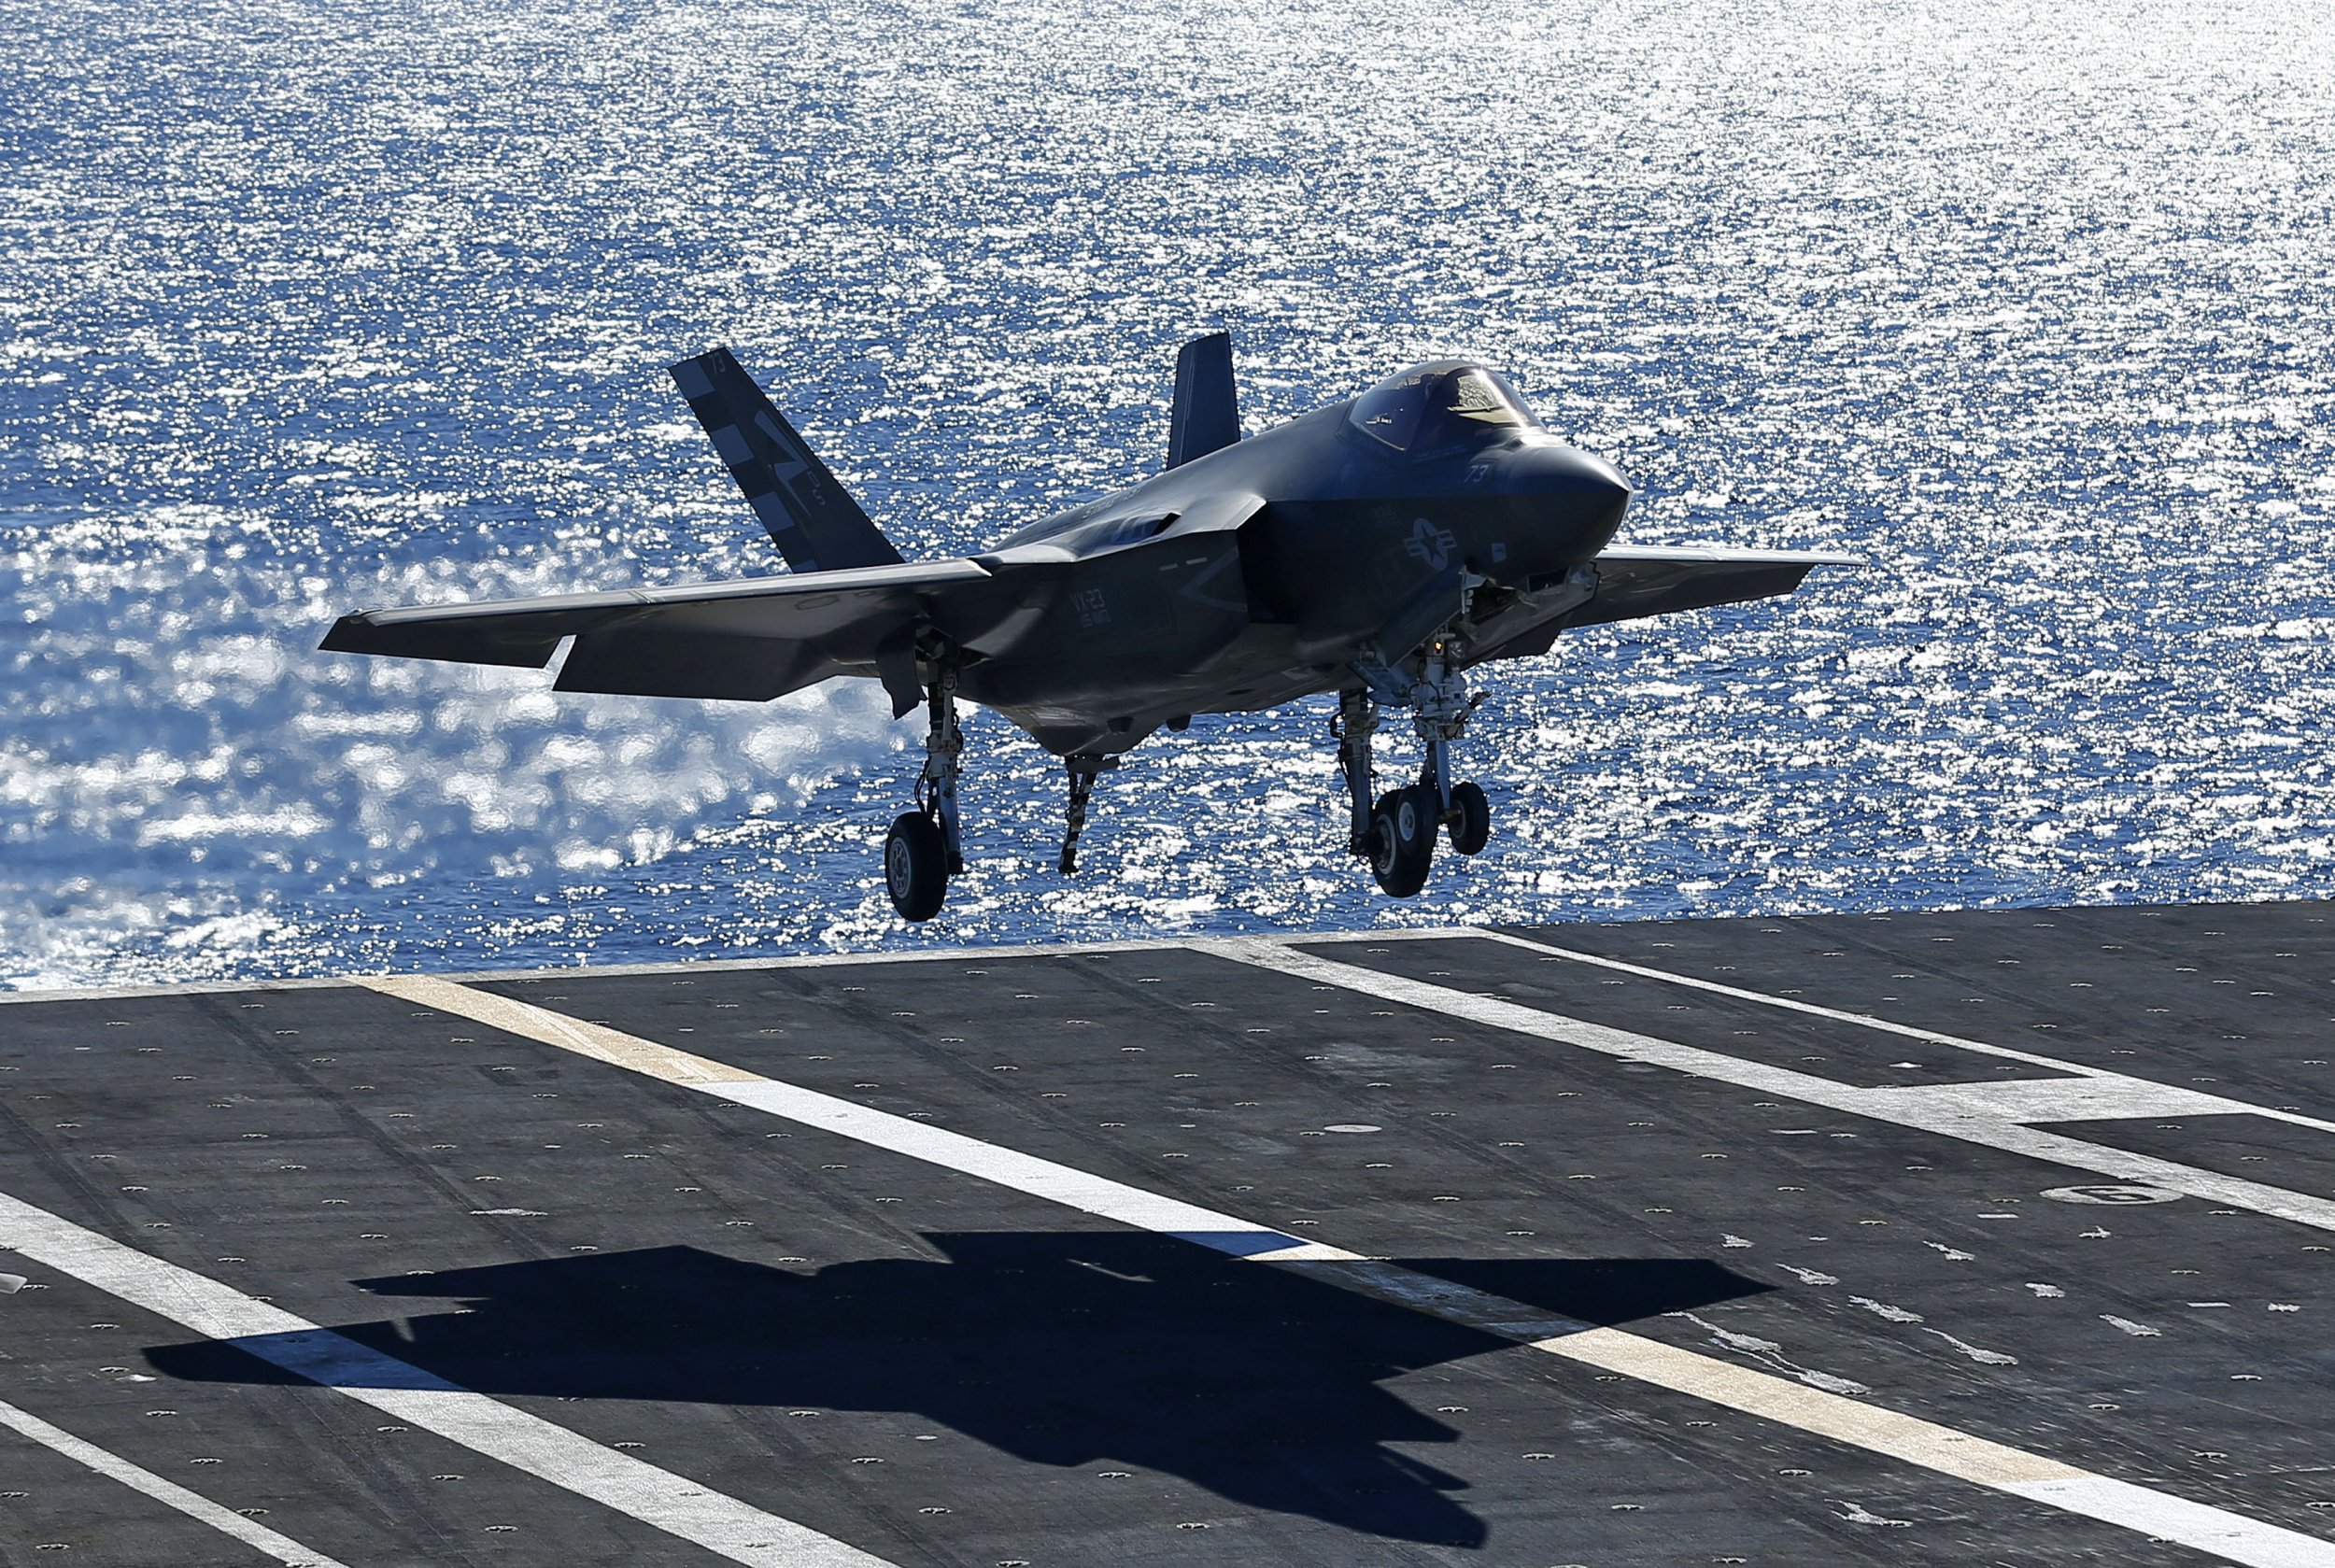 Despite Trump Criticism, U.S. Navy Pursues Expensive